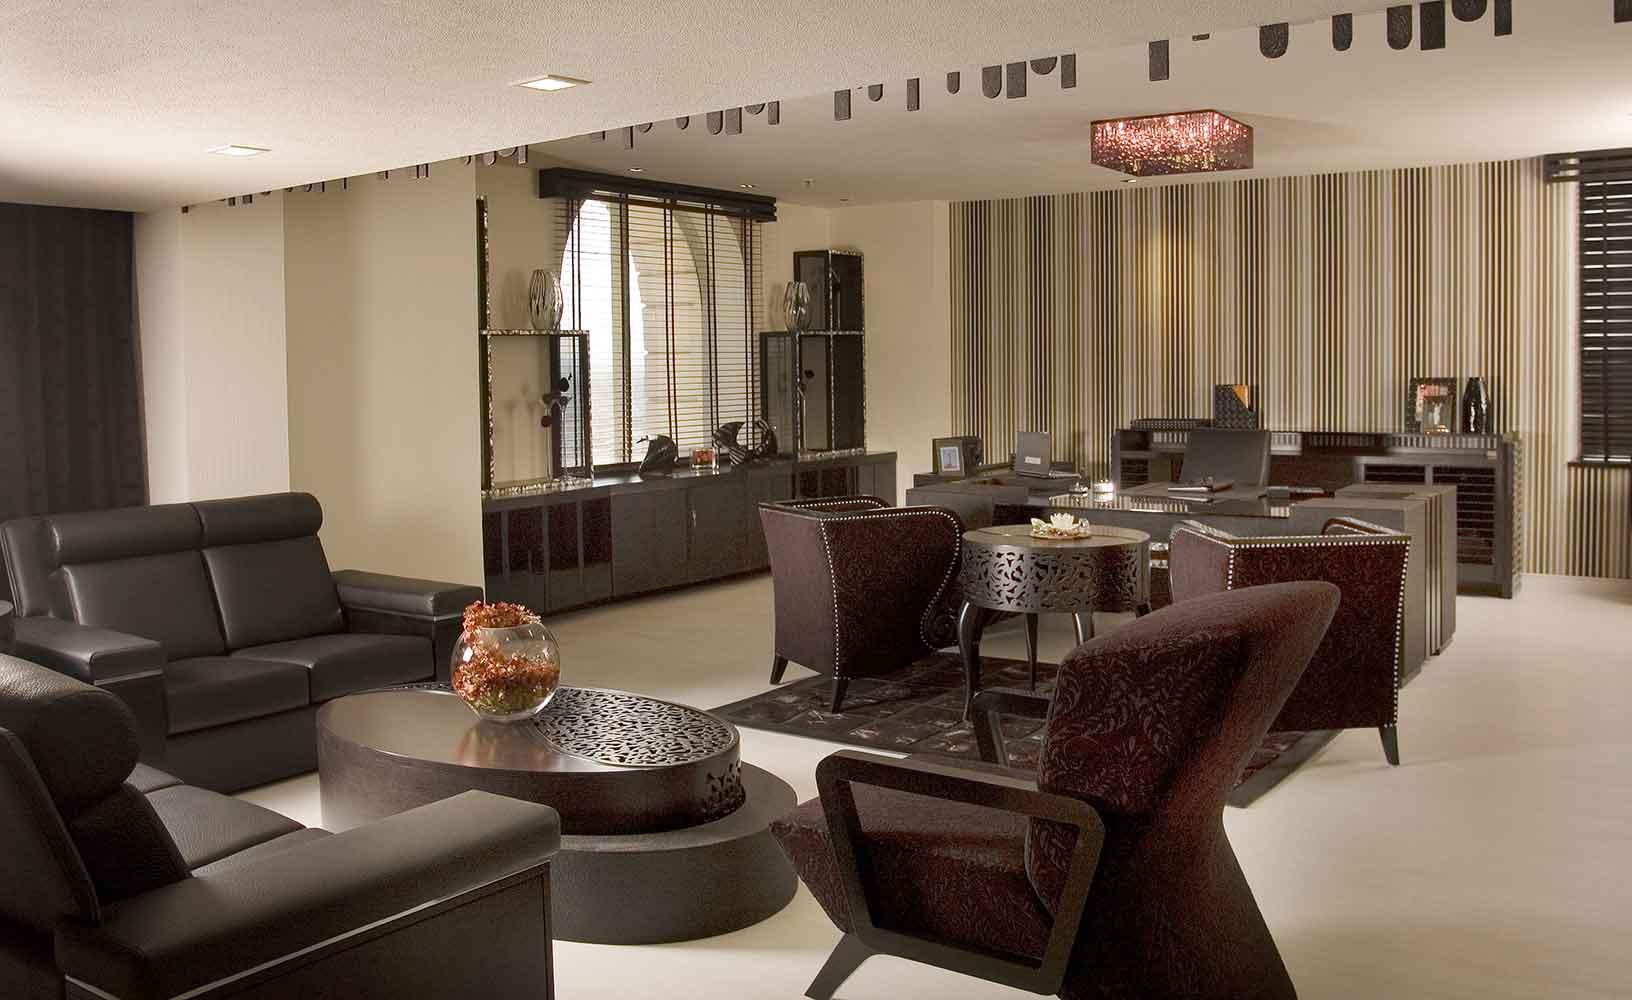 Индийский стиль Индийский стиль в интерьере Индийский стиль в интерьере La Sorogeeka Is Reshaping Indias Interior Design Scene